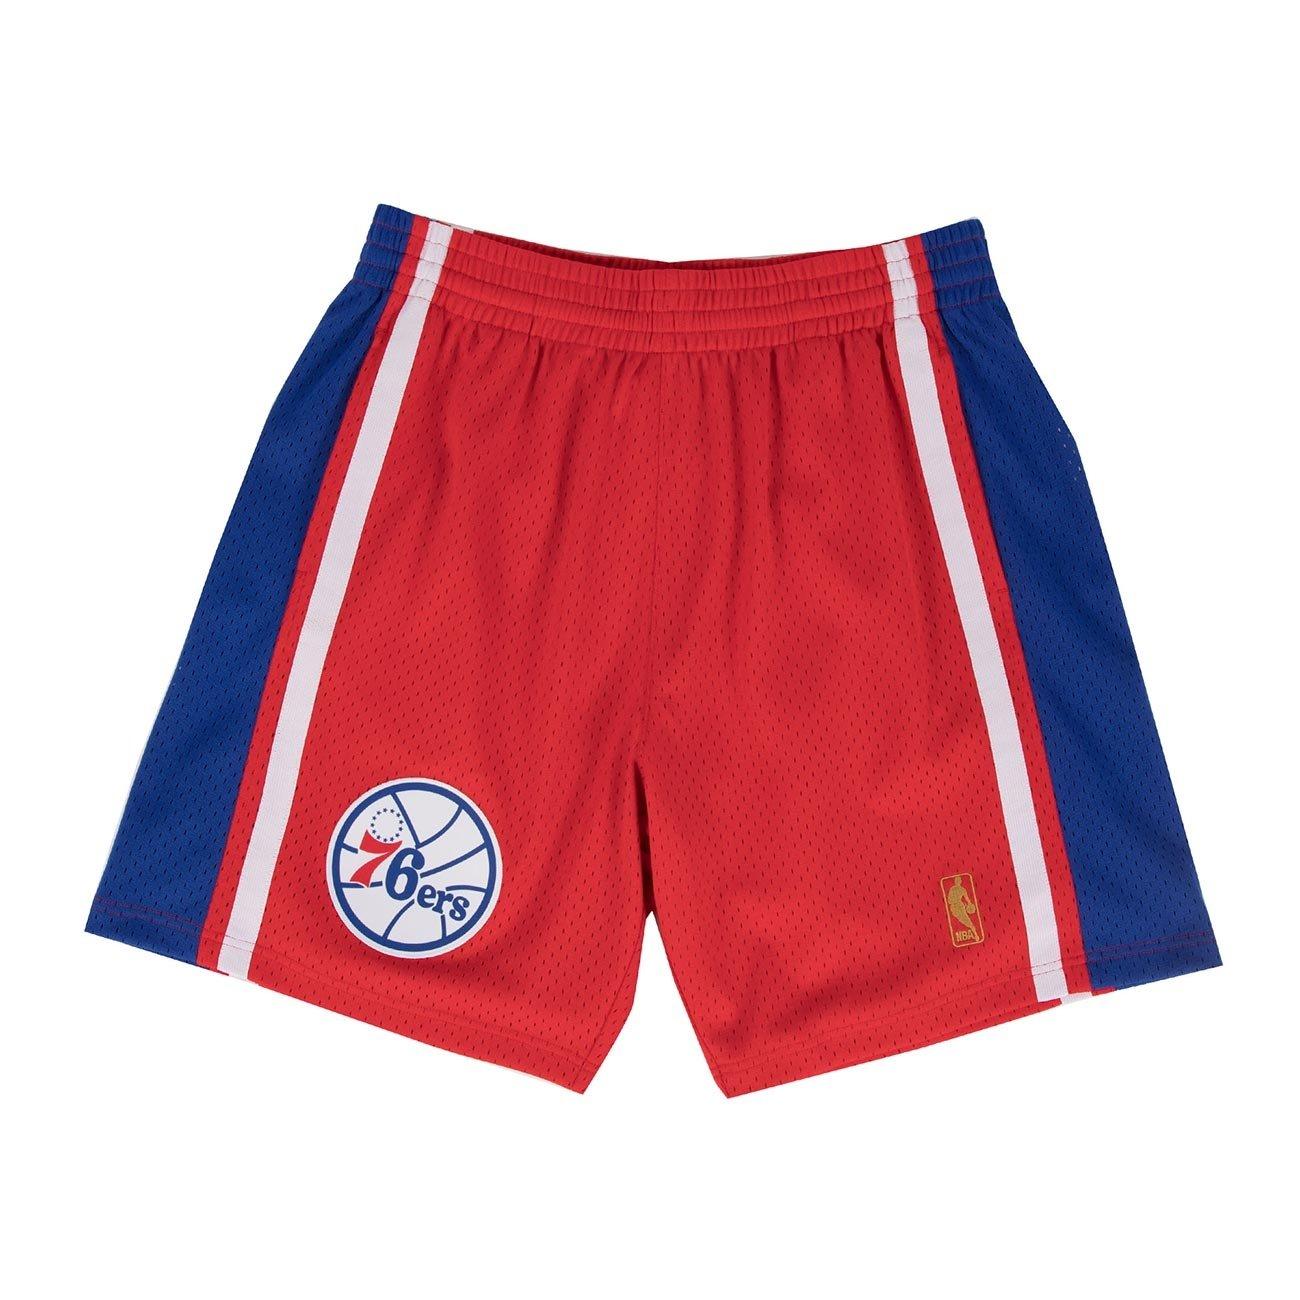 Mitchell & Ness Philadelphia 76ers 1996-97 Swingman NBA Shorts Rot